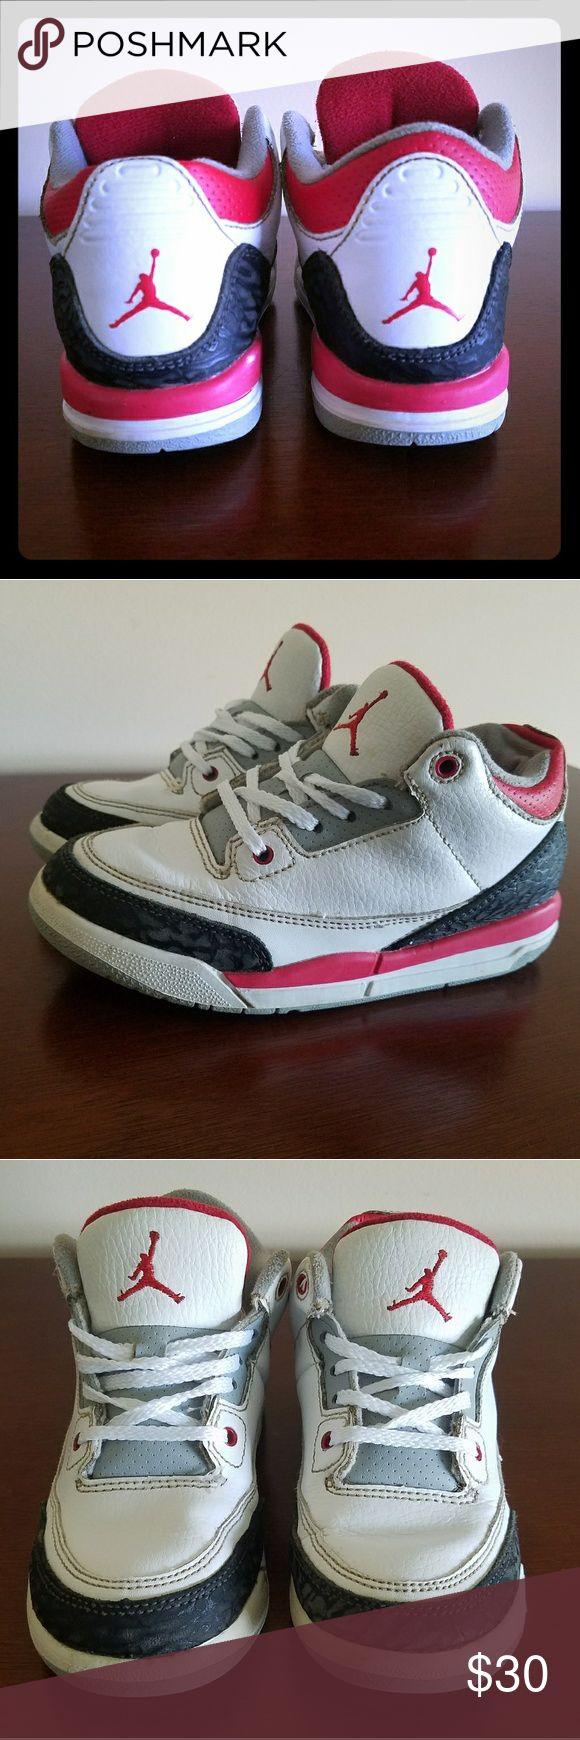 Nike Jordan kid's sneakers Jordan kid's sneakers size 12 C circa 2013. Red, white, black and gray. Very good condition. Jordan Shoes Sneakers